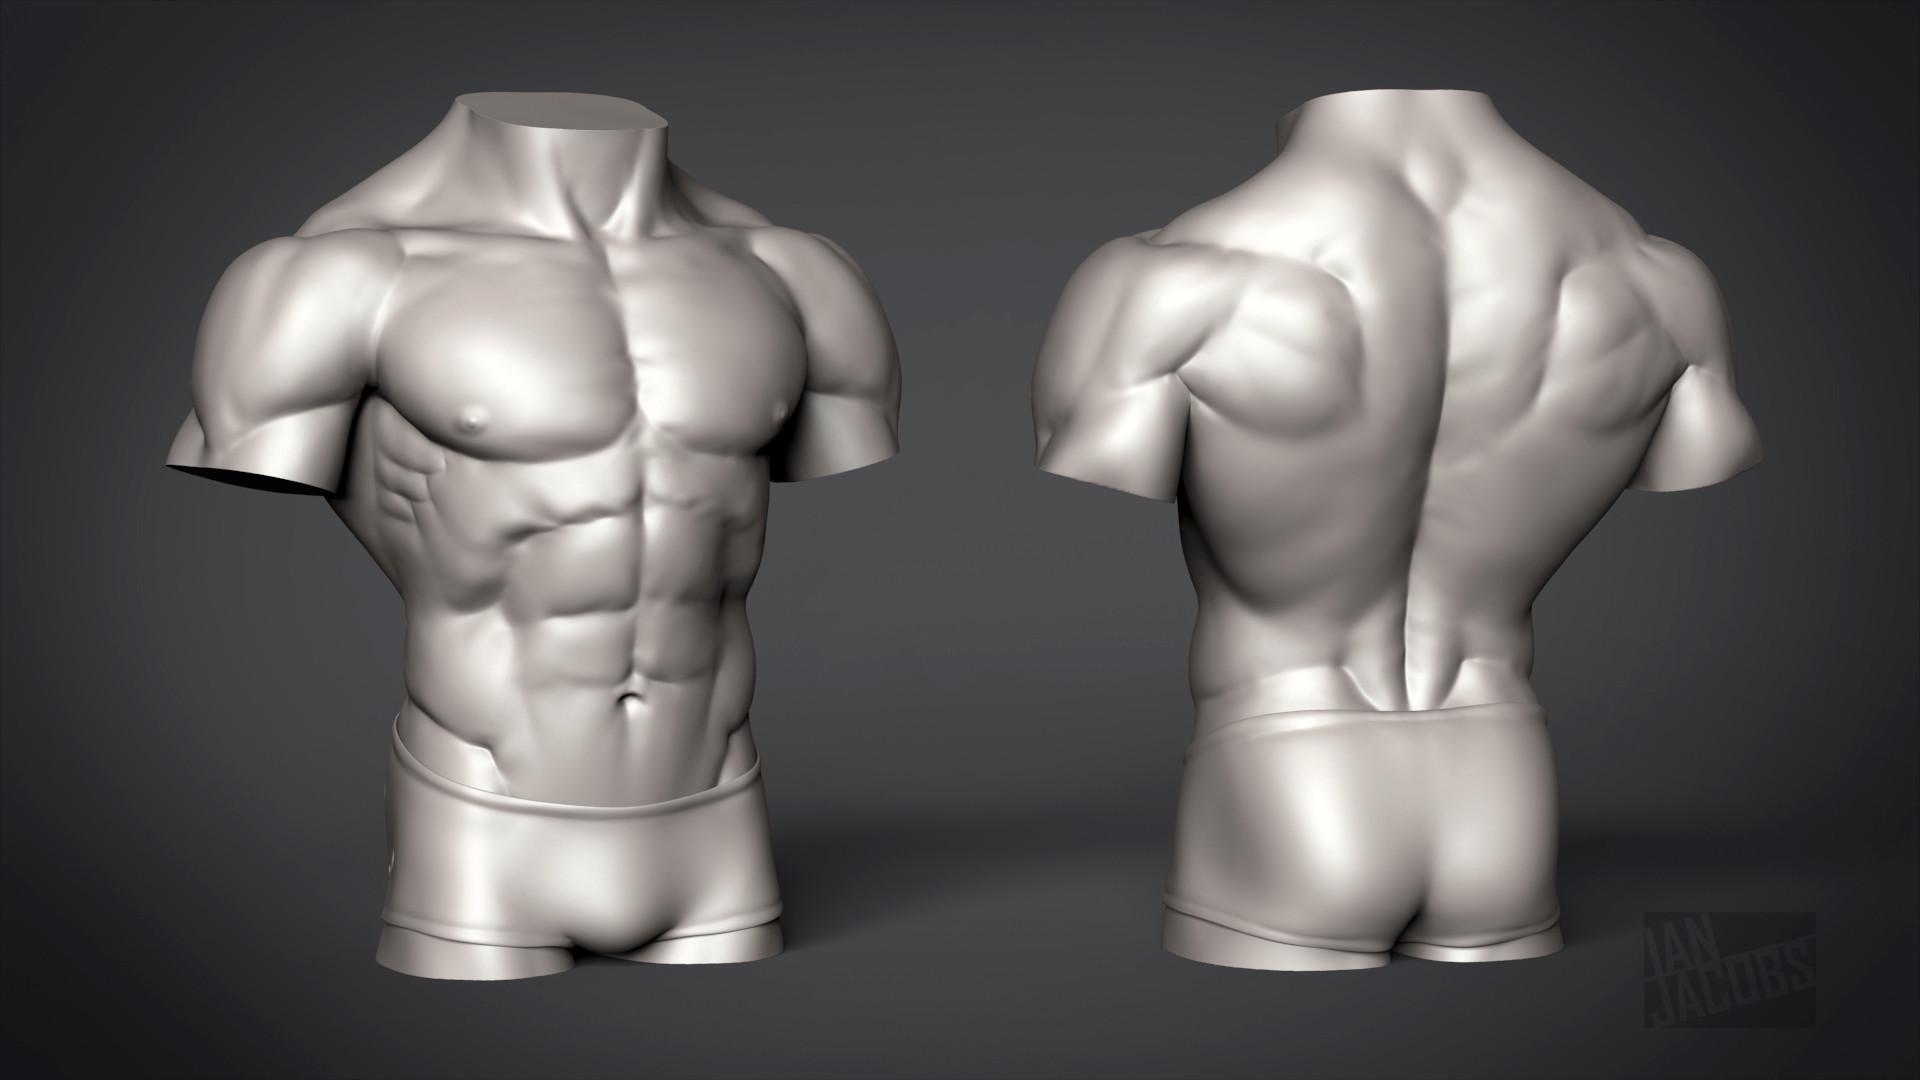 ArtStation - Male Torso - Anatomy Study, Ian Jacobs